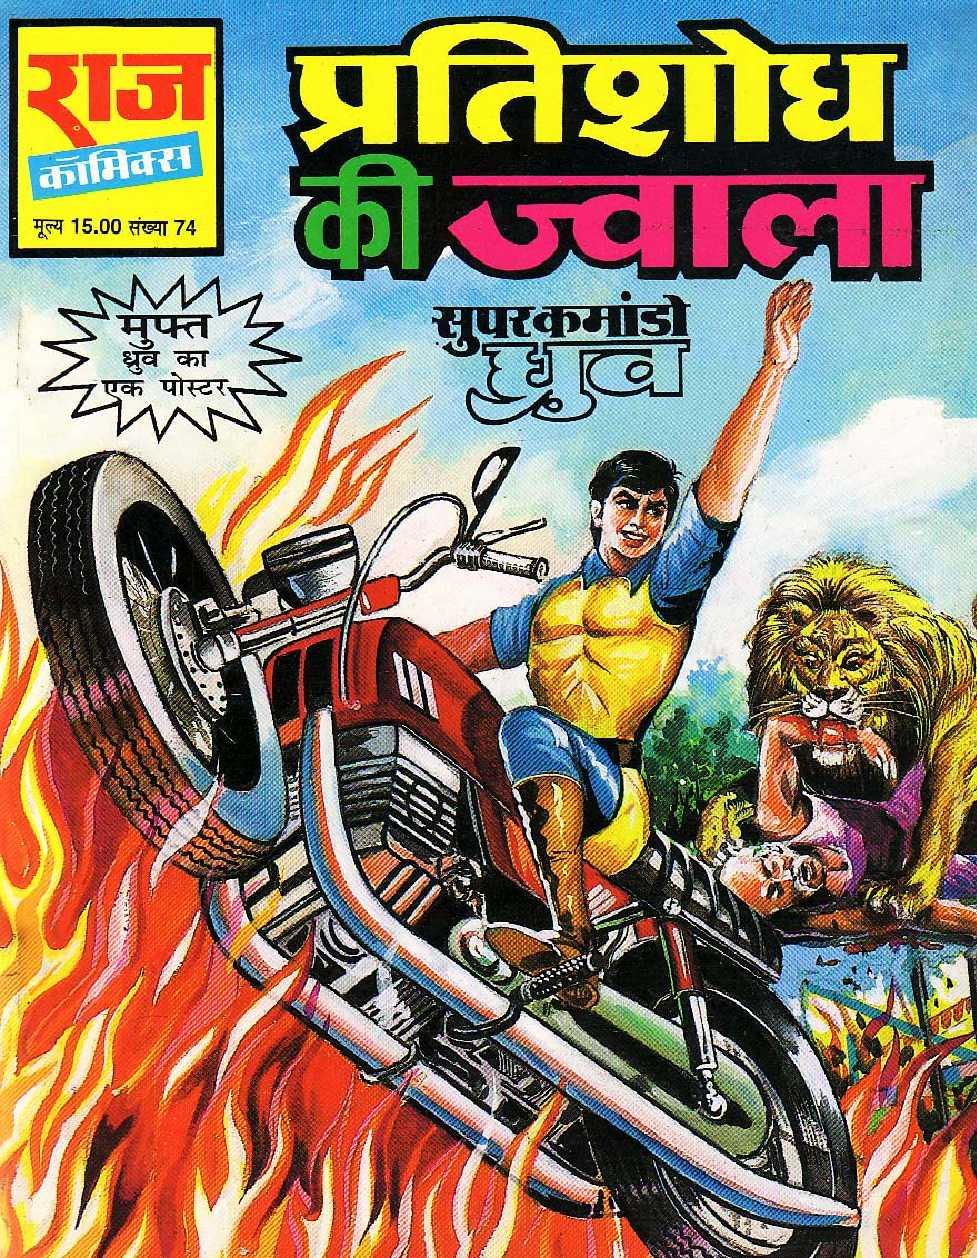 Read Comics Online Free: Pratishodh Ki Jwala (01_Dhruv)